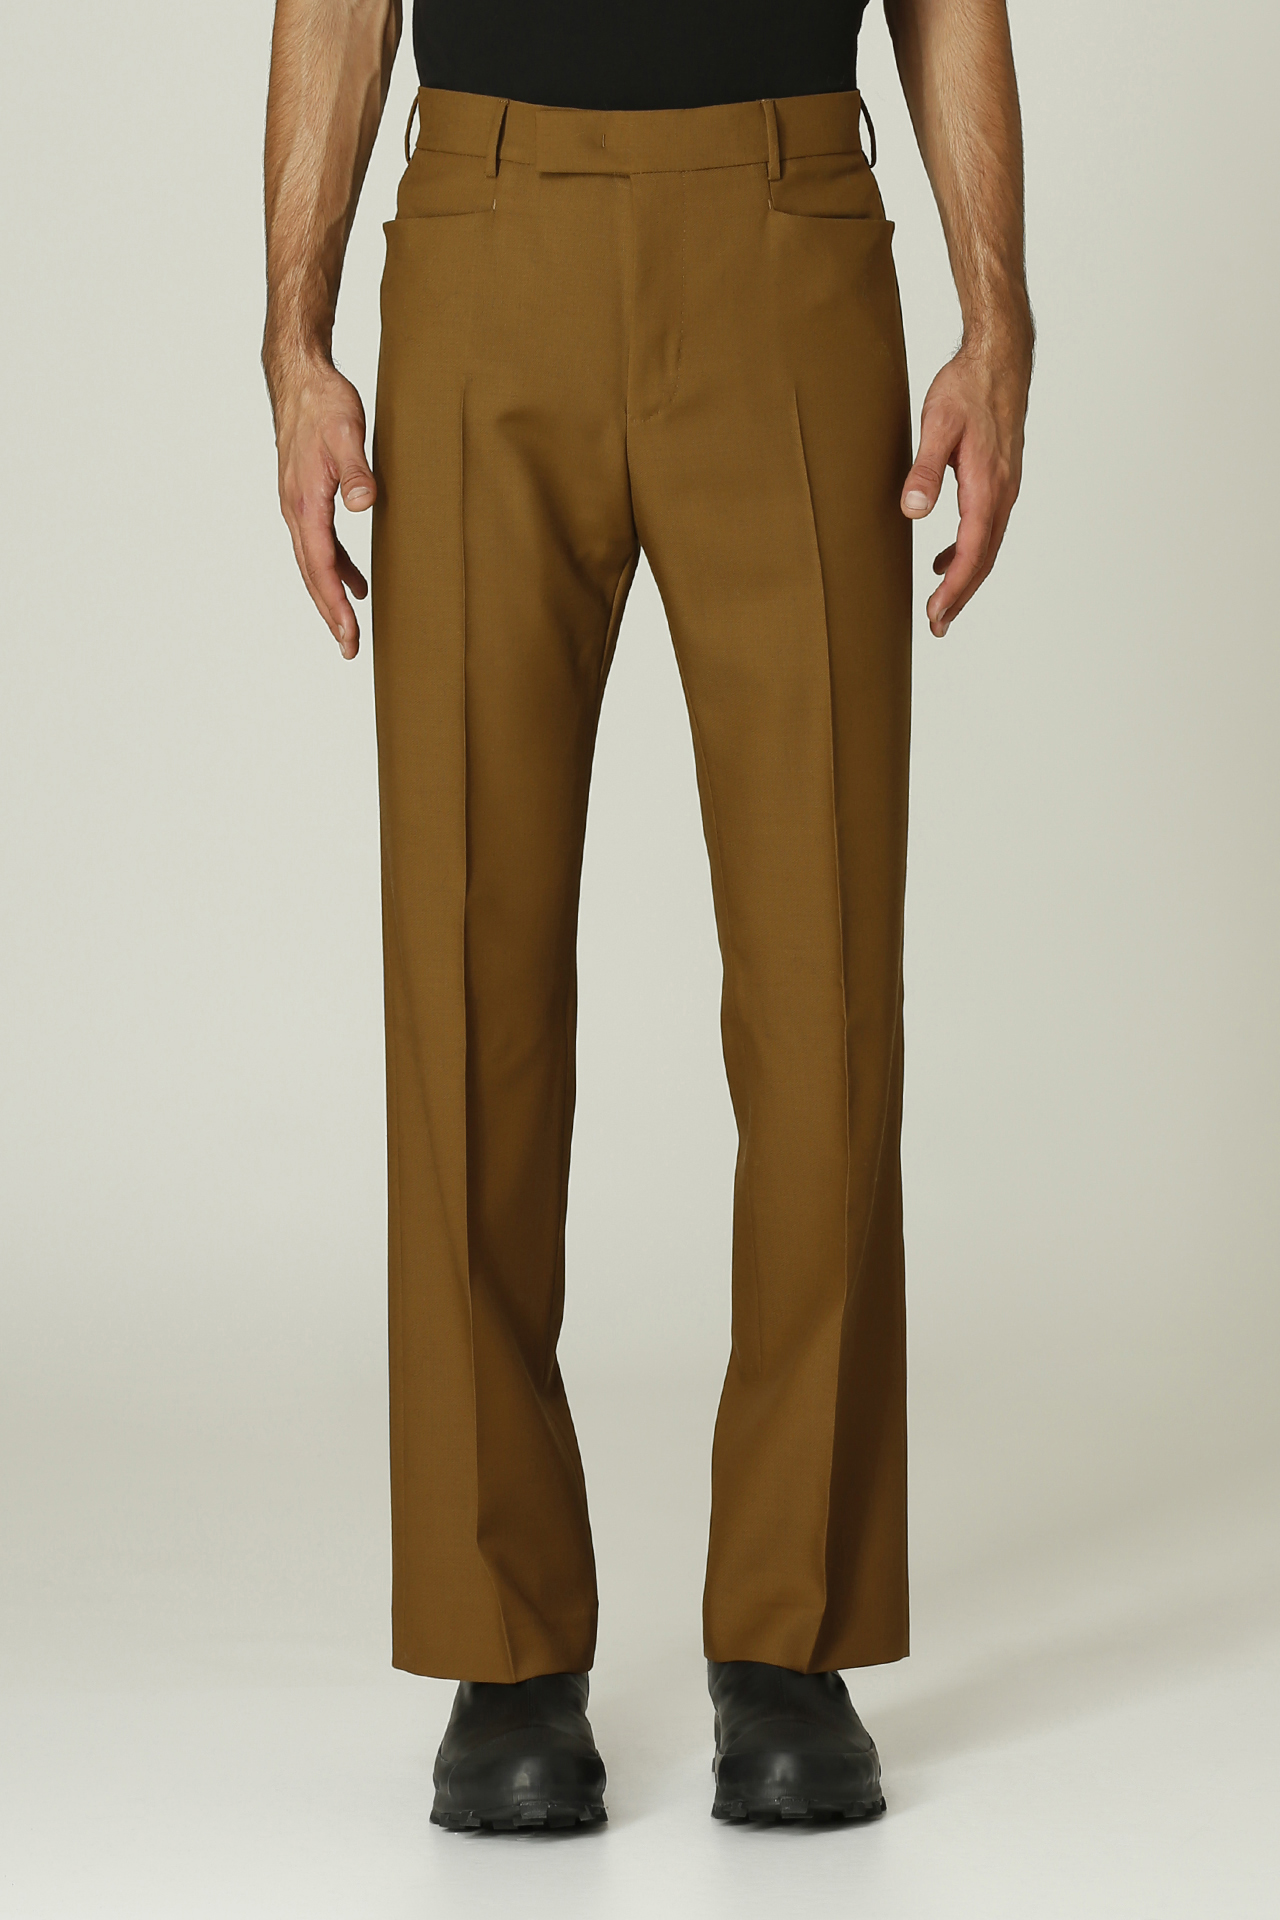 PT TORINO   Pantalone   MR43MARRONE